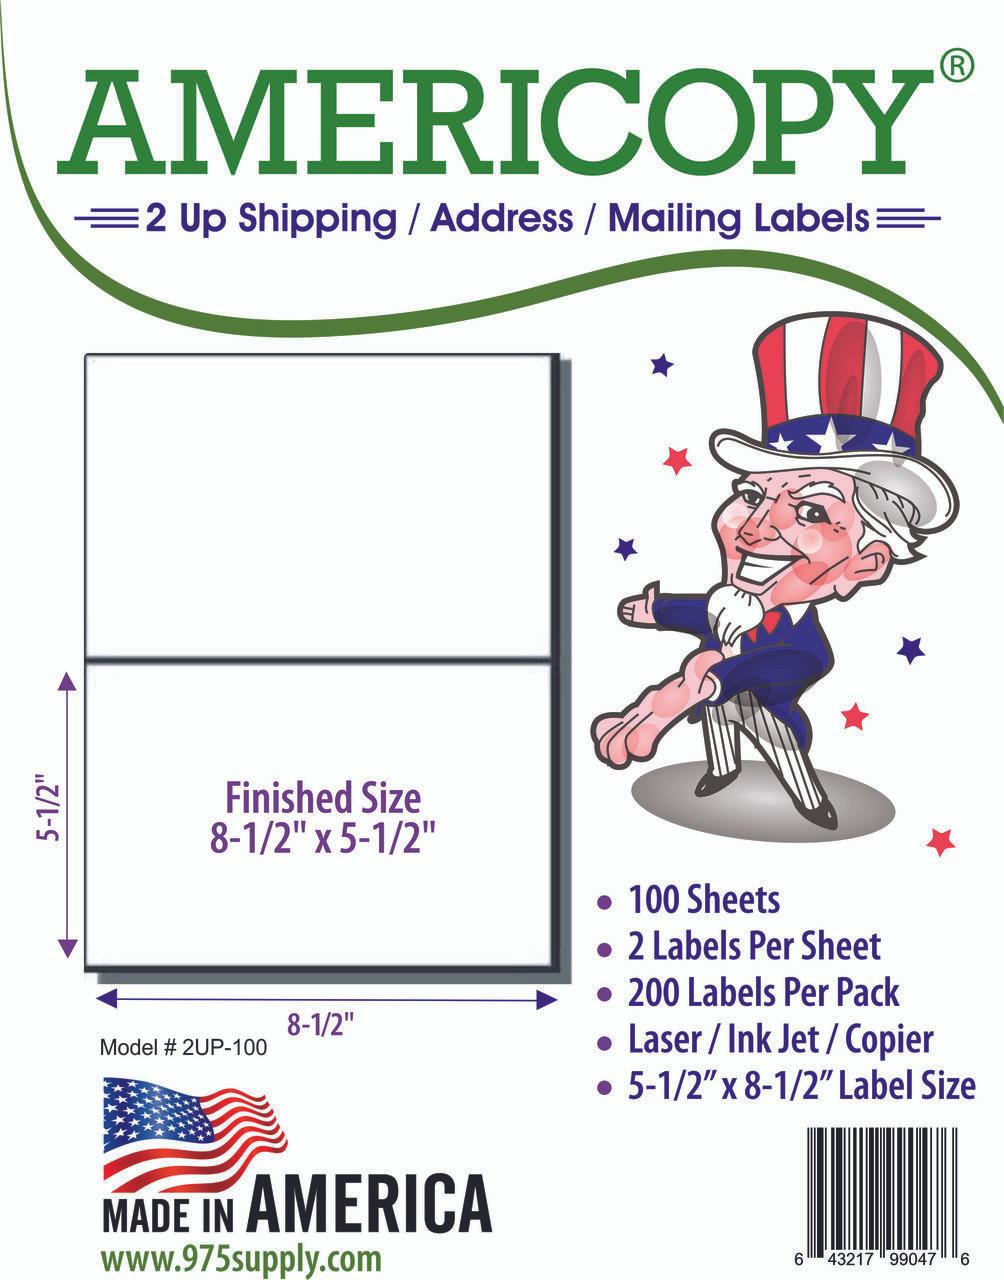 americopy labels half sheet labels 8 1 2 x 5 1 2 2 labels